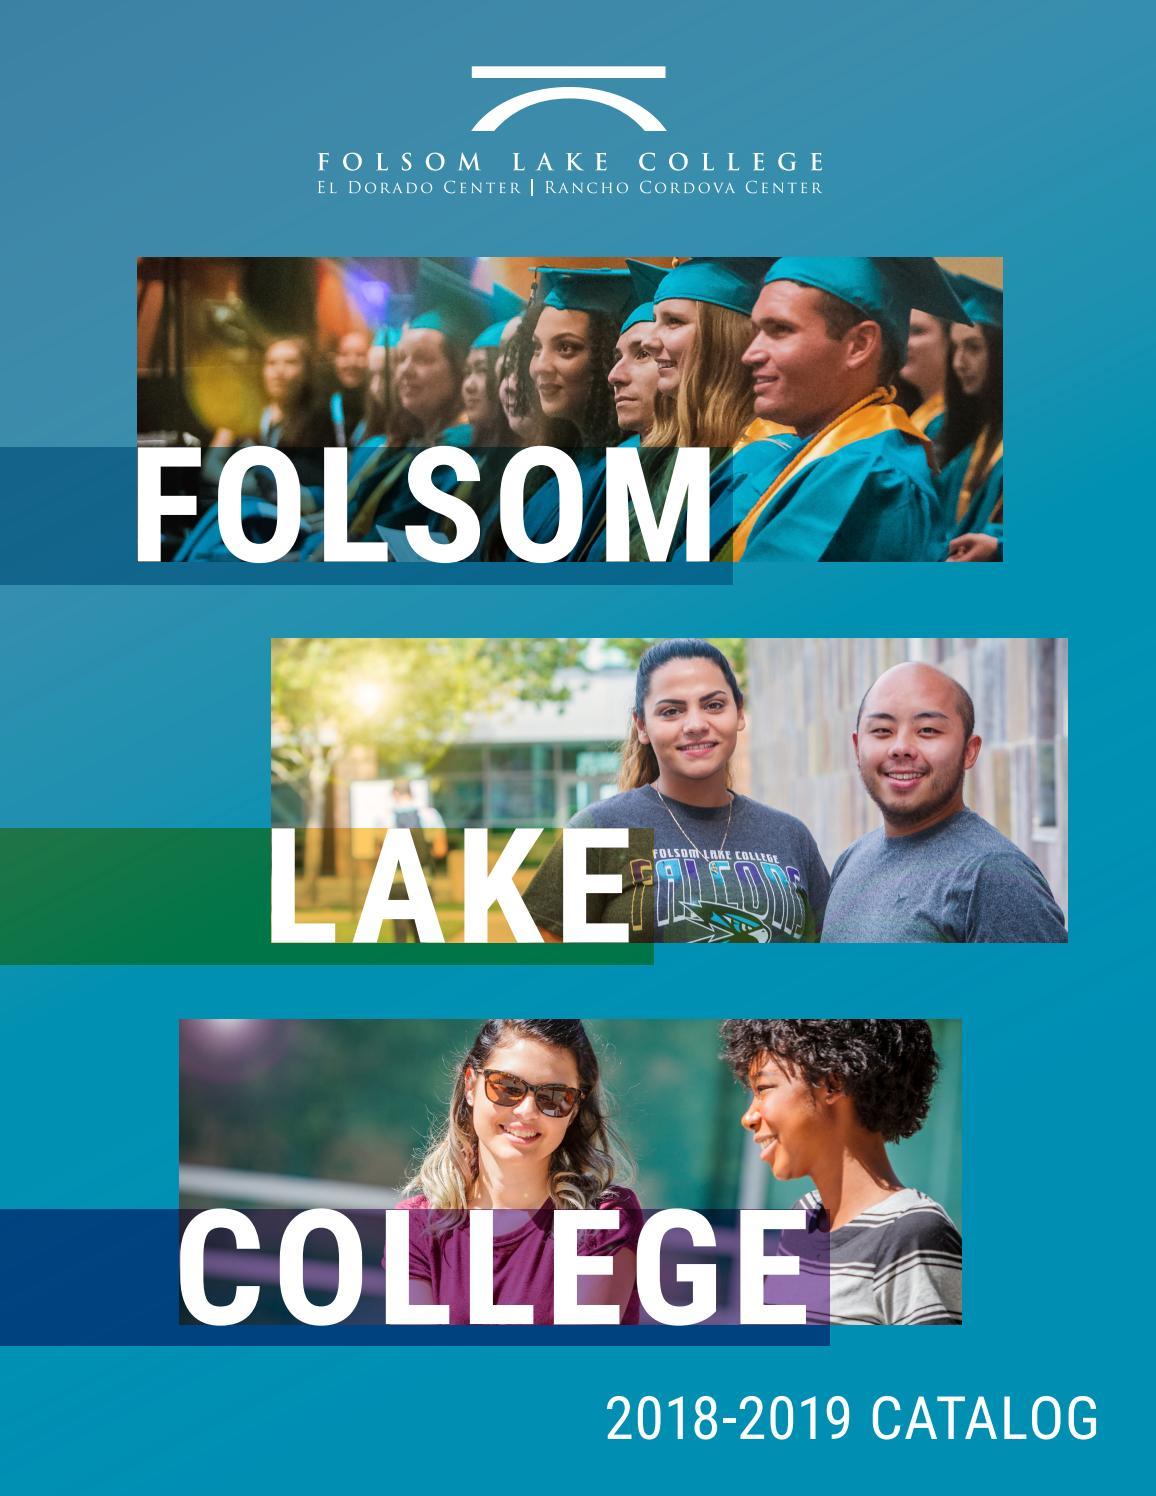 Folsom Lake College 2018-2019 Catalog by flcfalcons - issuu